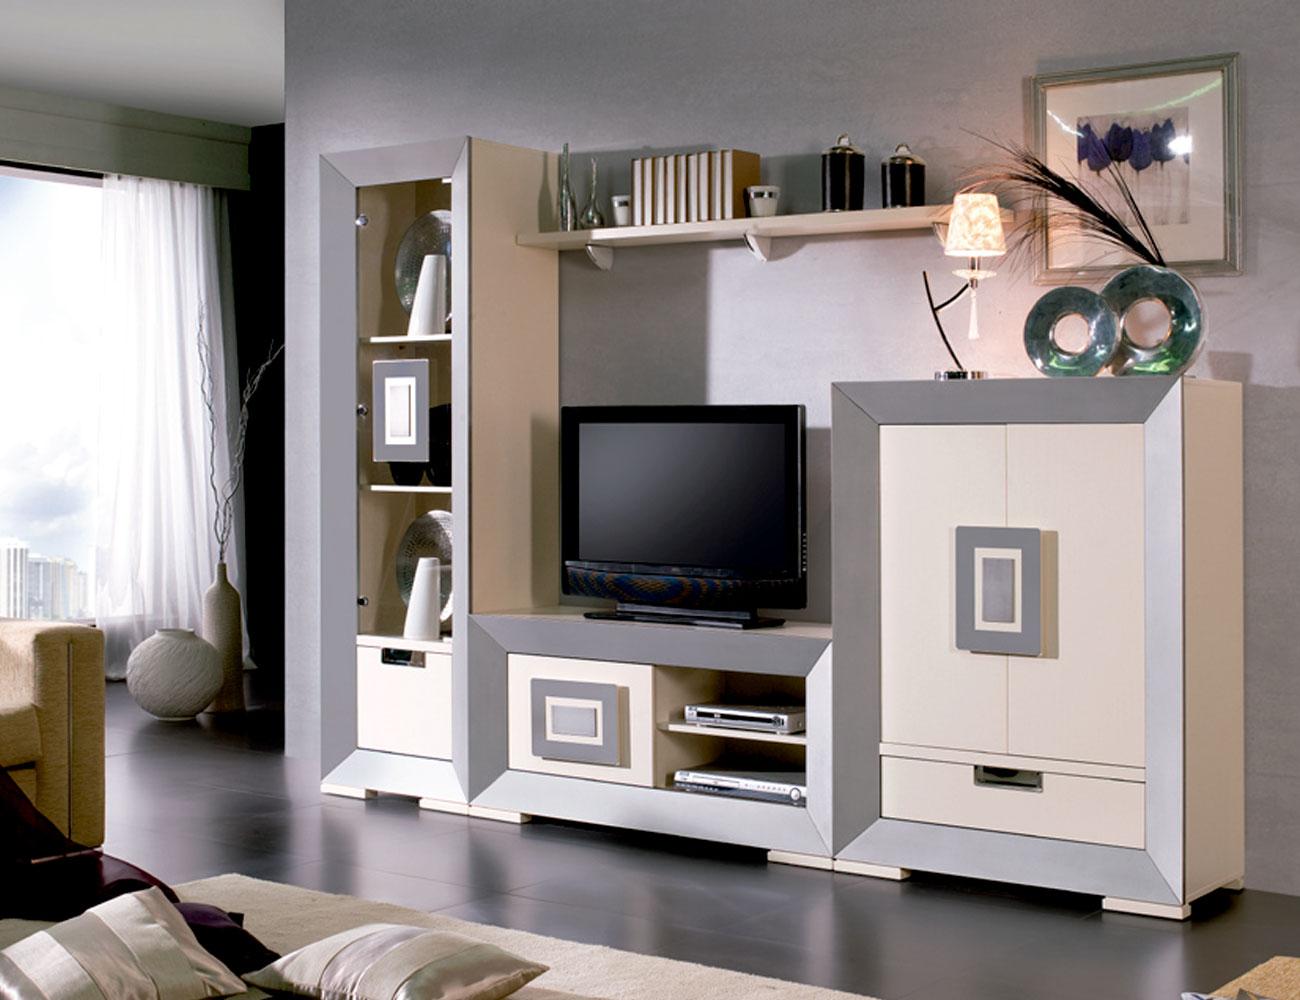 Mueble salon neoclasico color 504 503 tirador acero